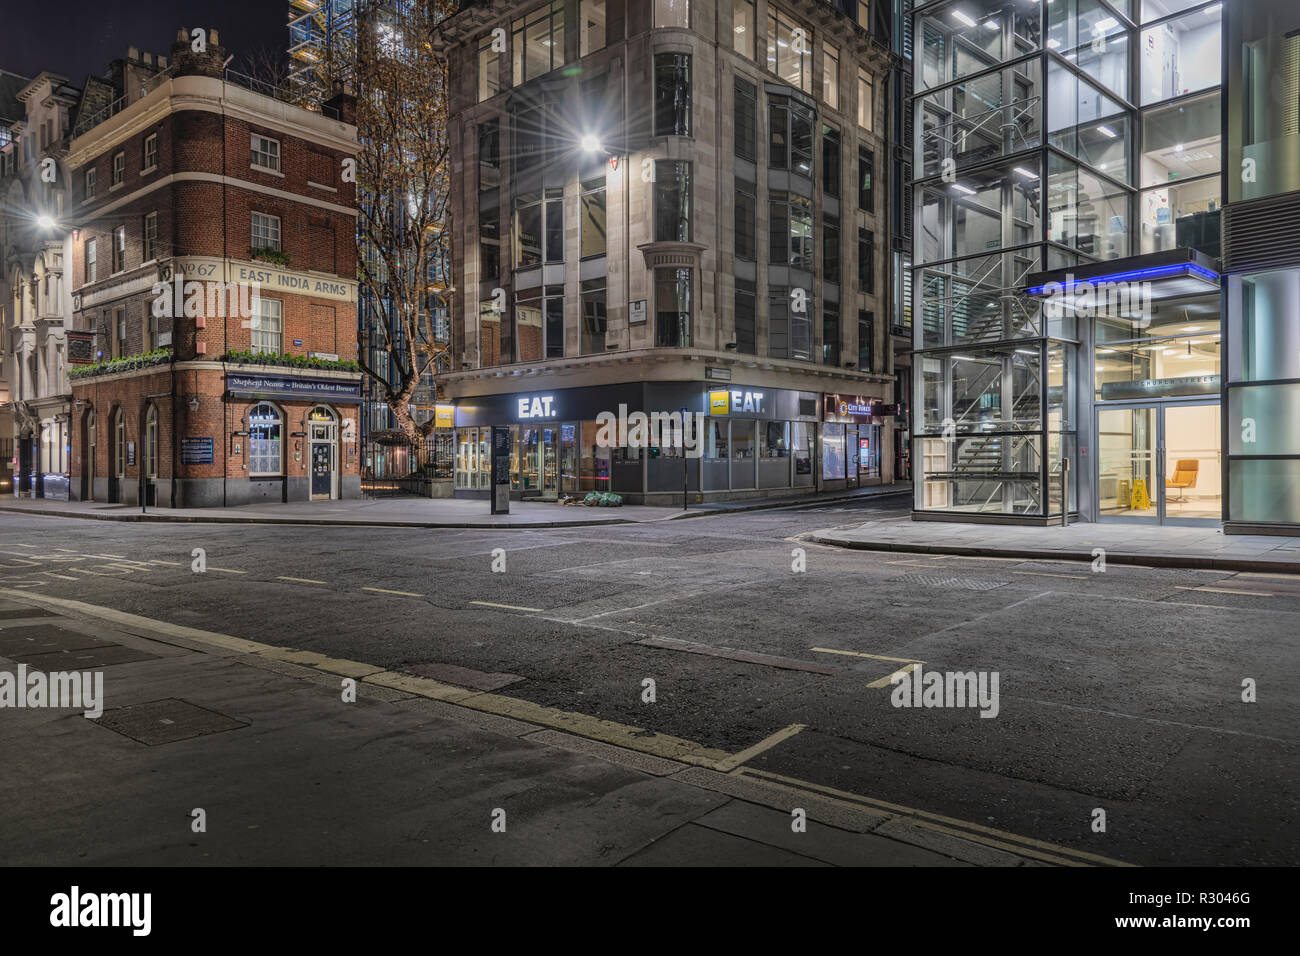 Deserted London street at night - Stock Image